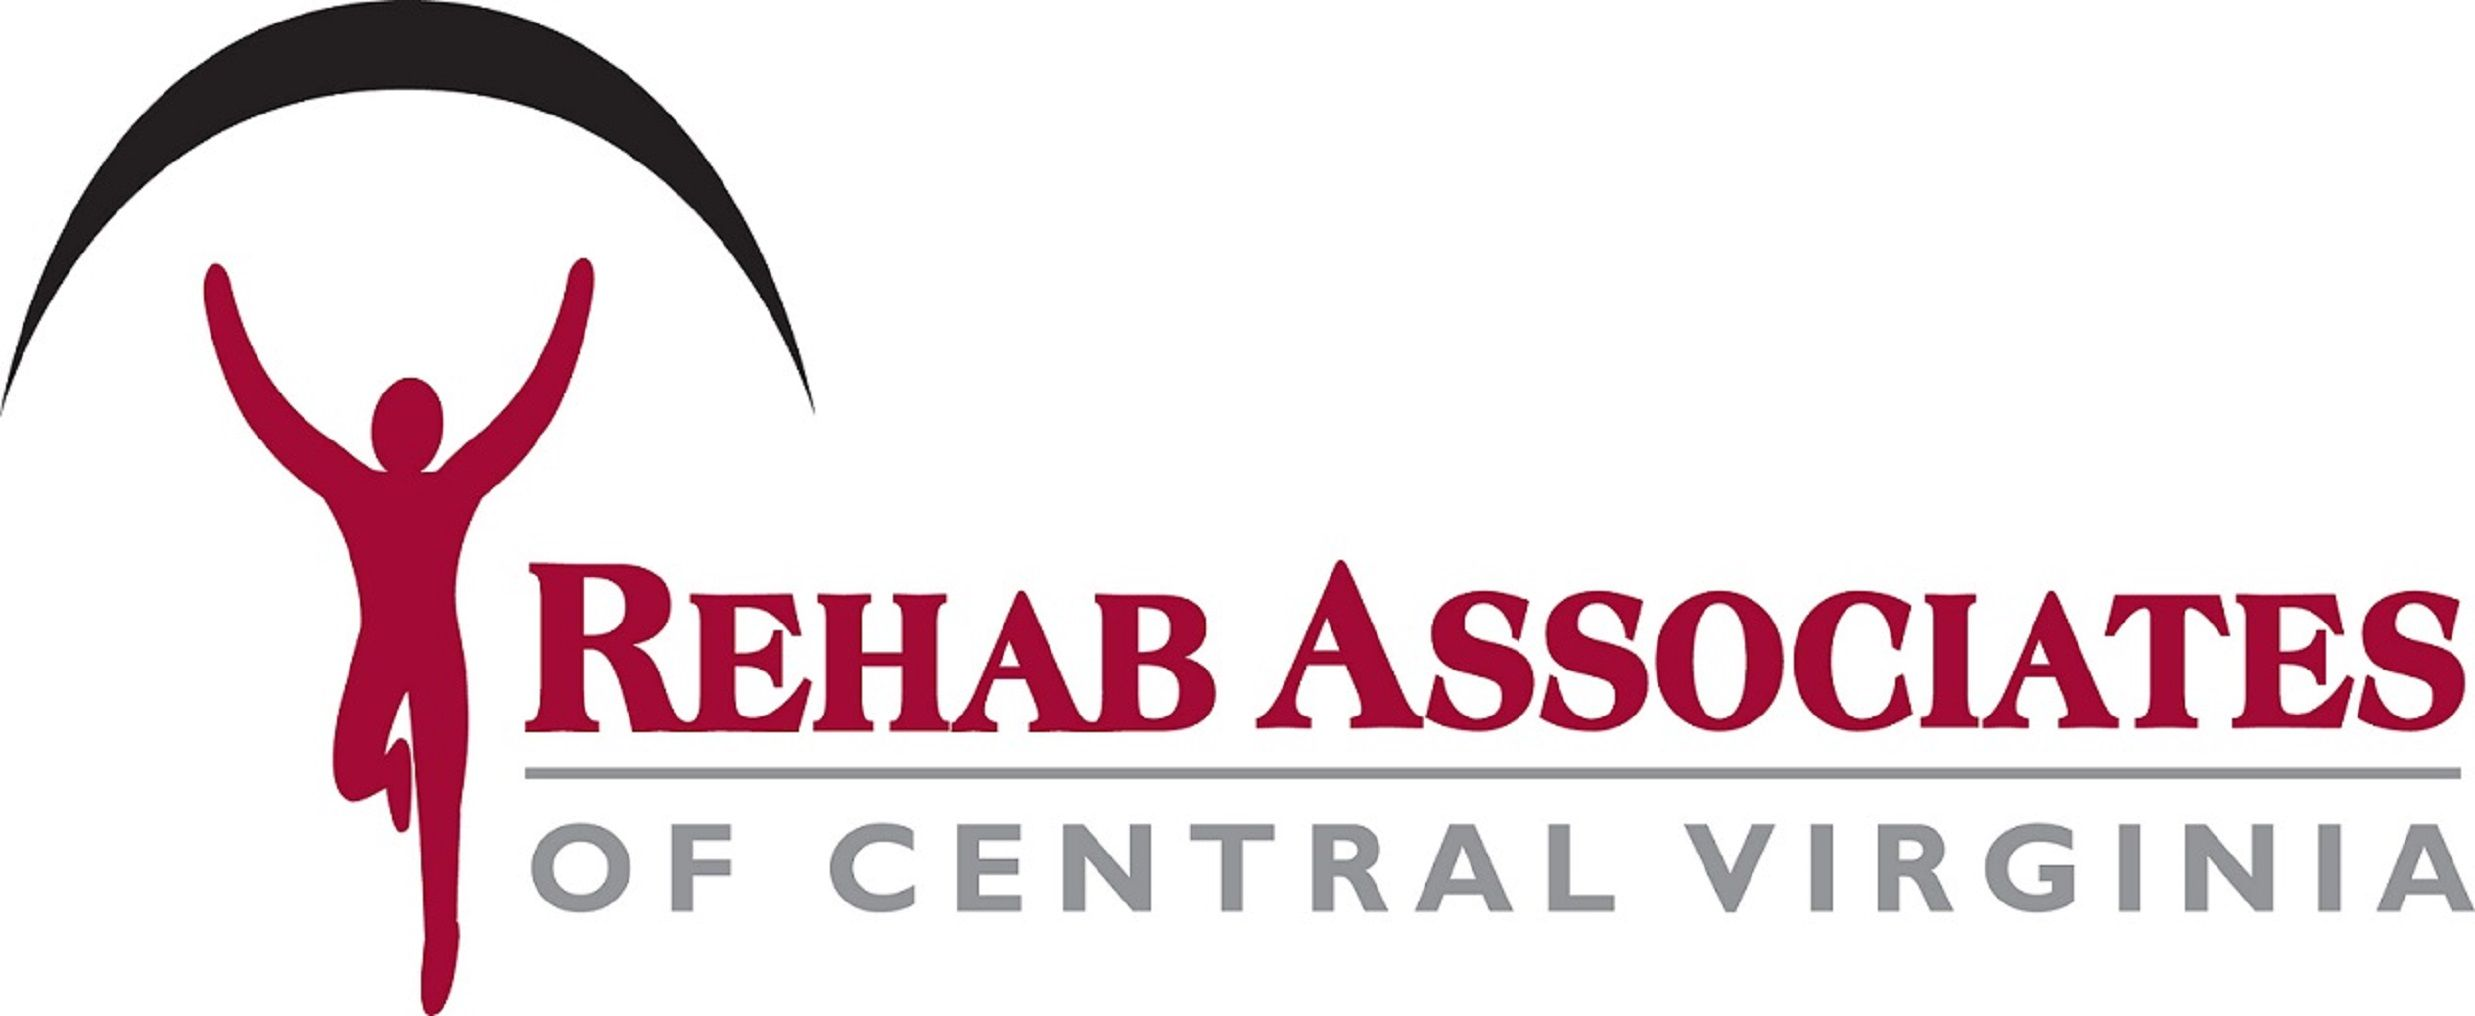 ClinicOfTheMonth Rehab Associates of Central Virginia